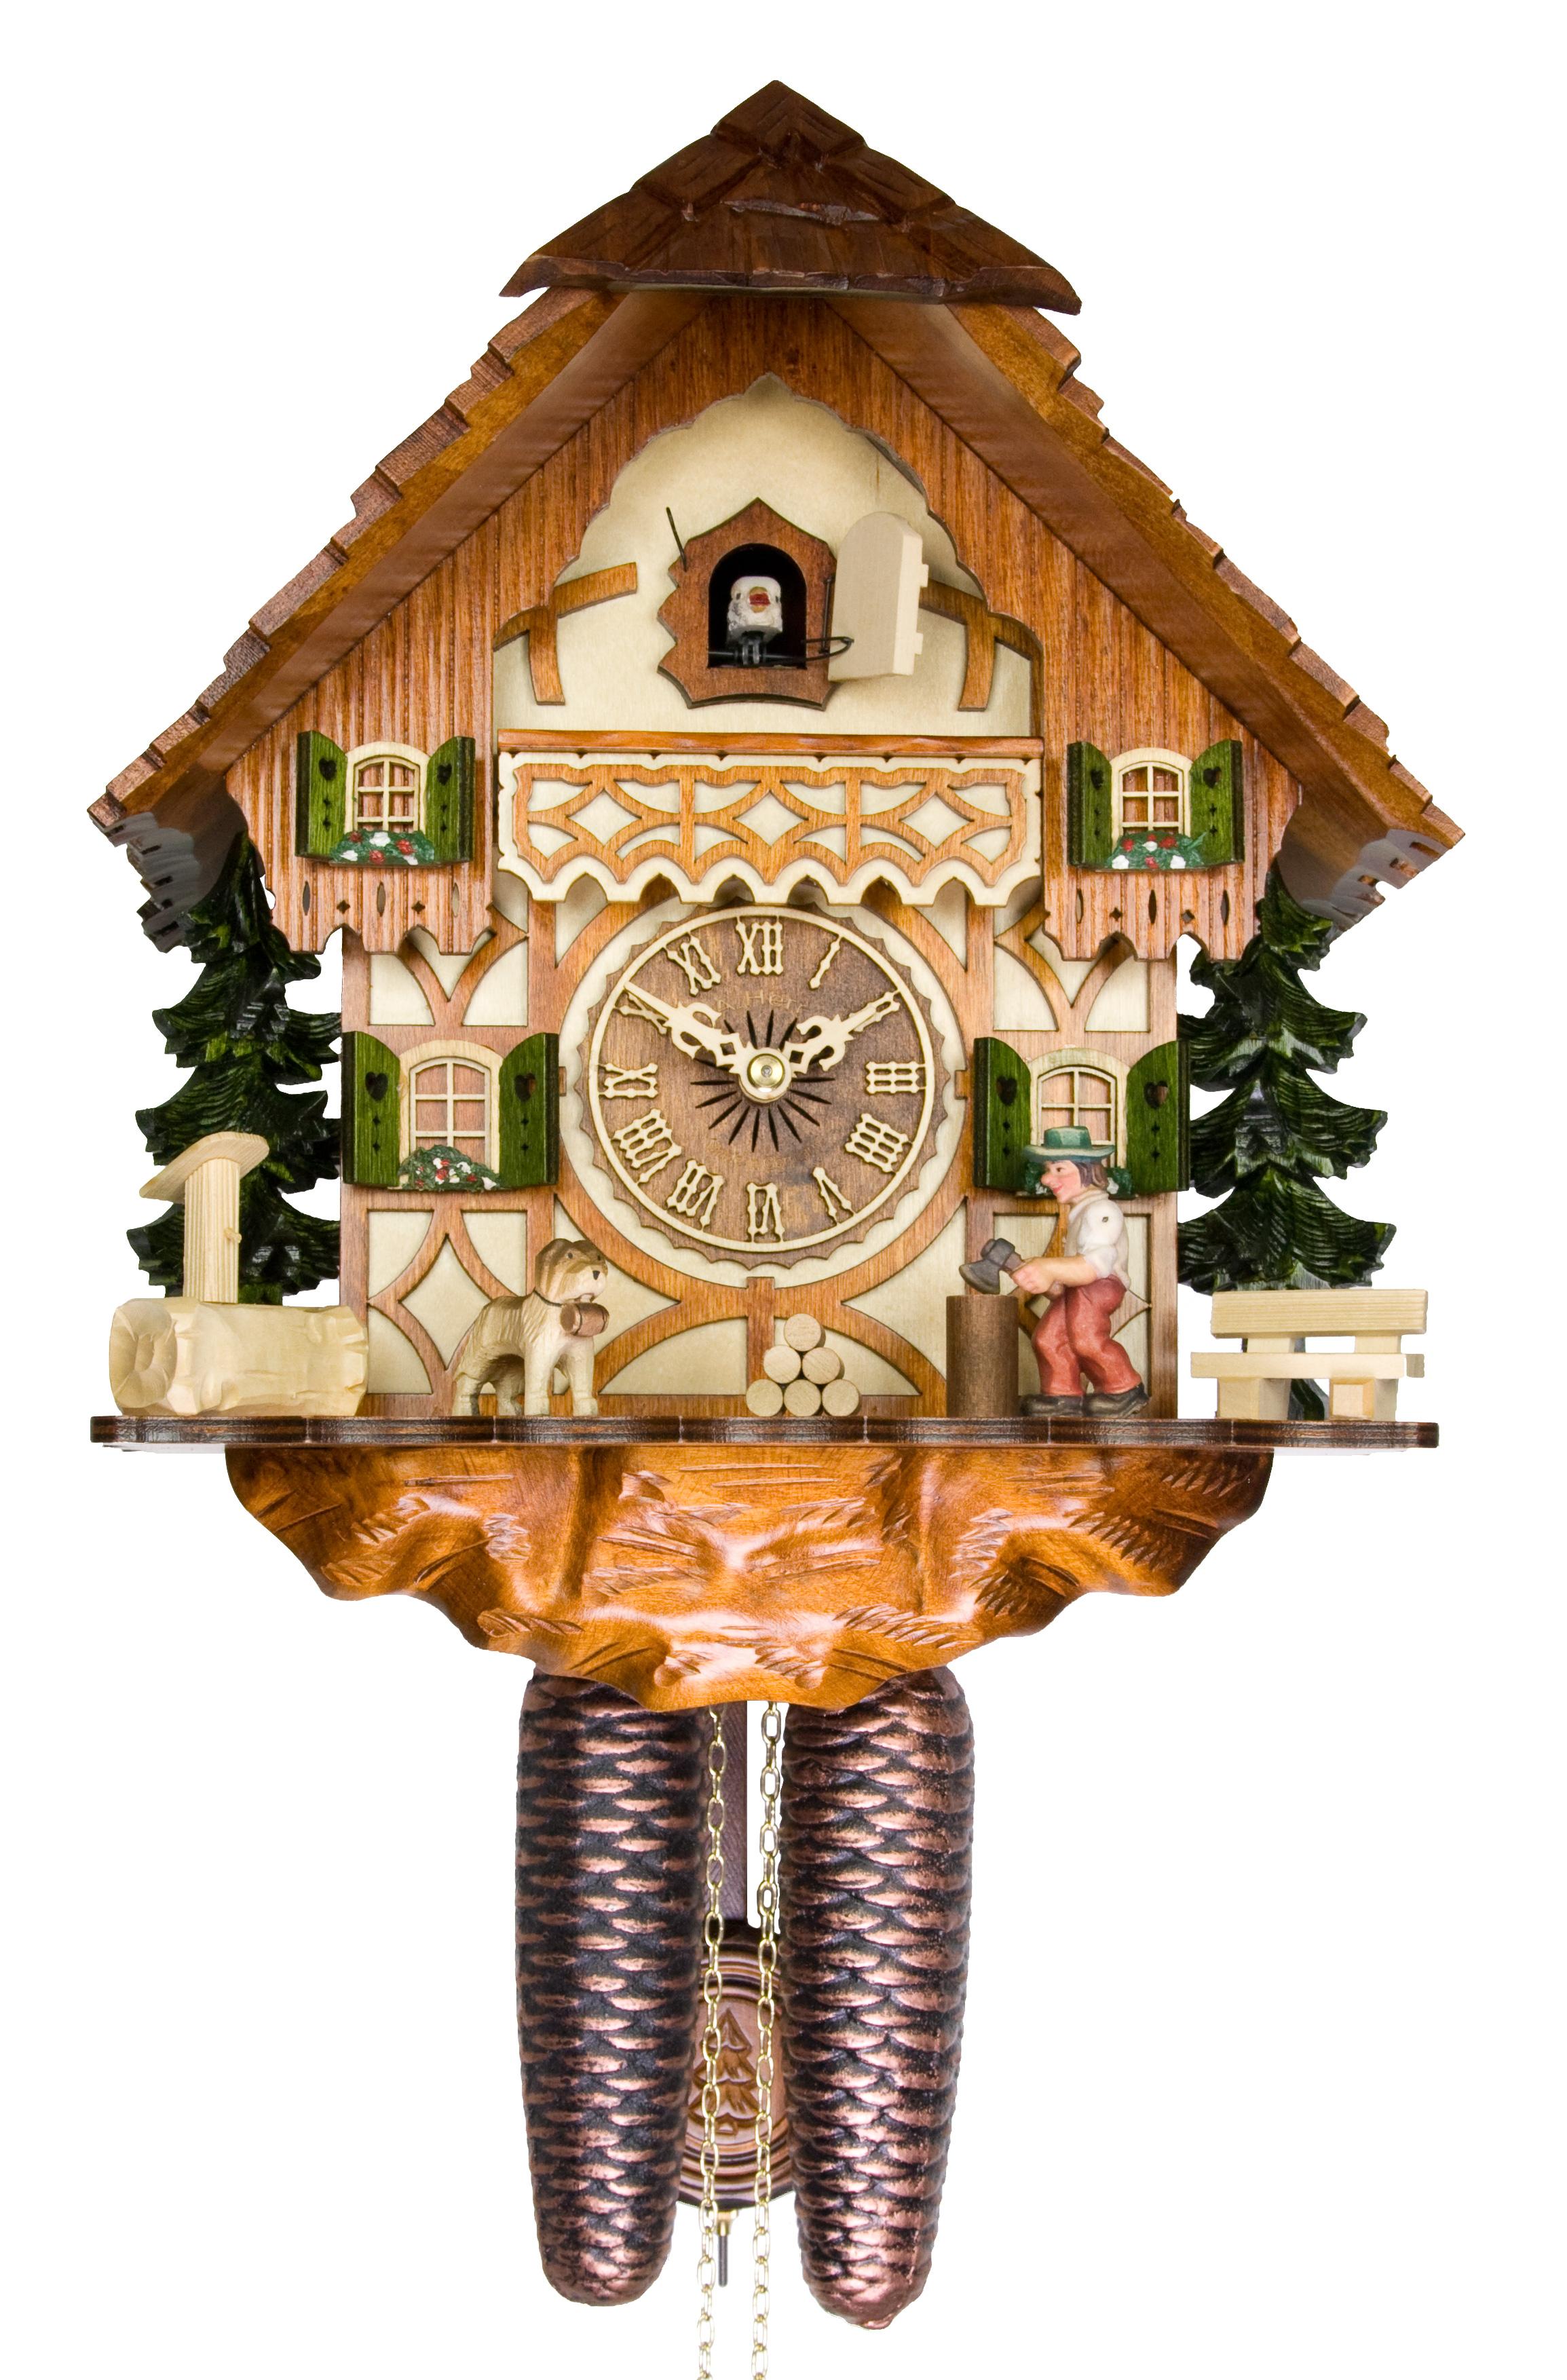 Adolf herr cuckoo clock the busy wood chopper ah 317 1 8t new ebay - Wooden cuckoo clocks ...